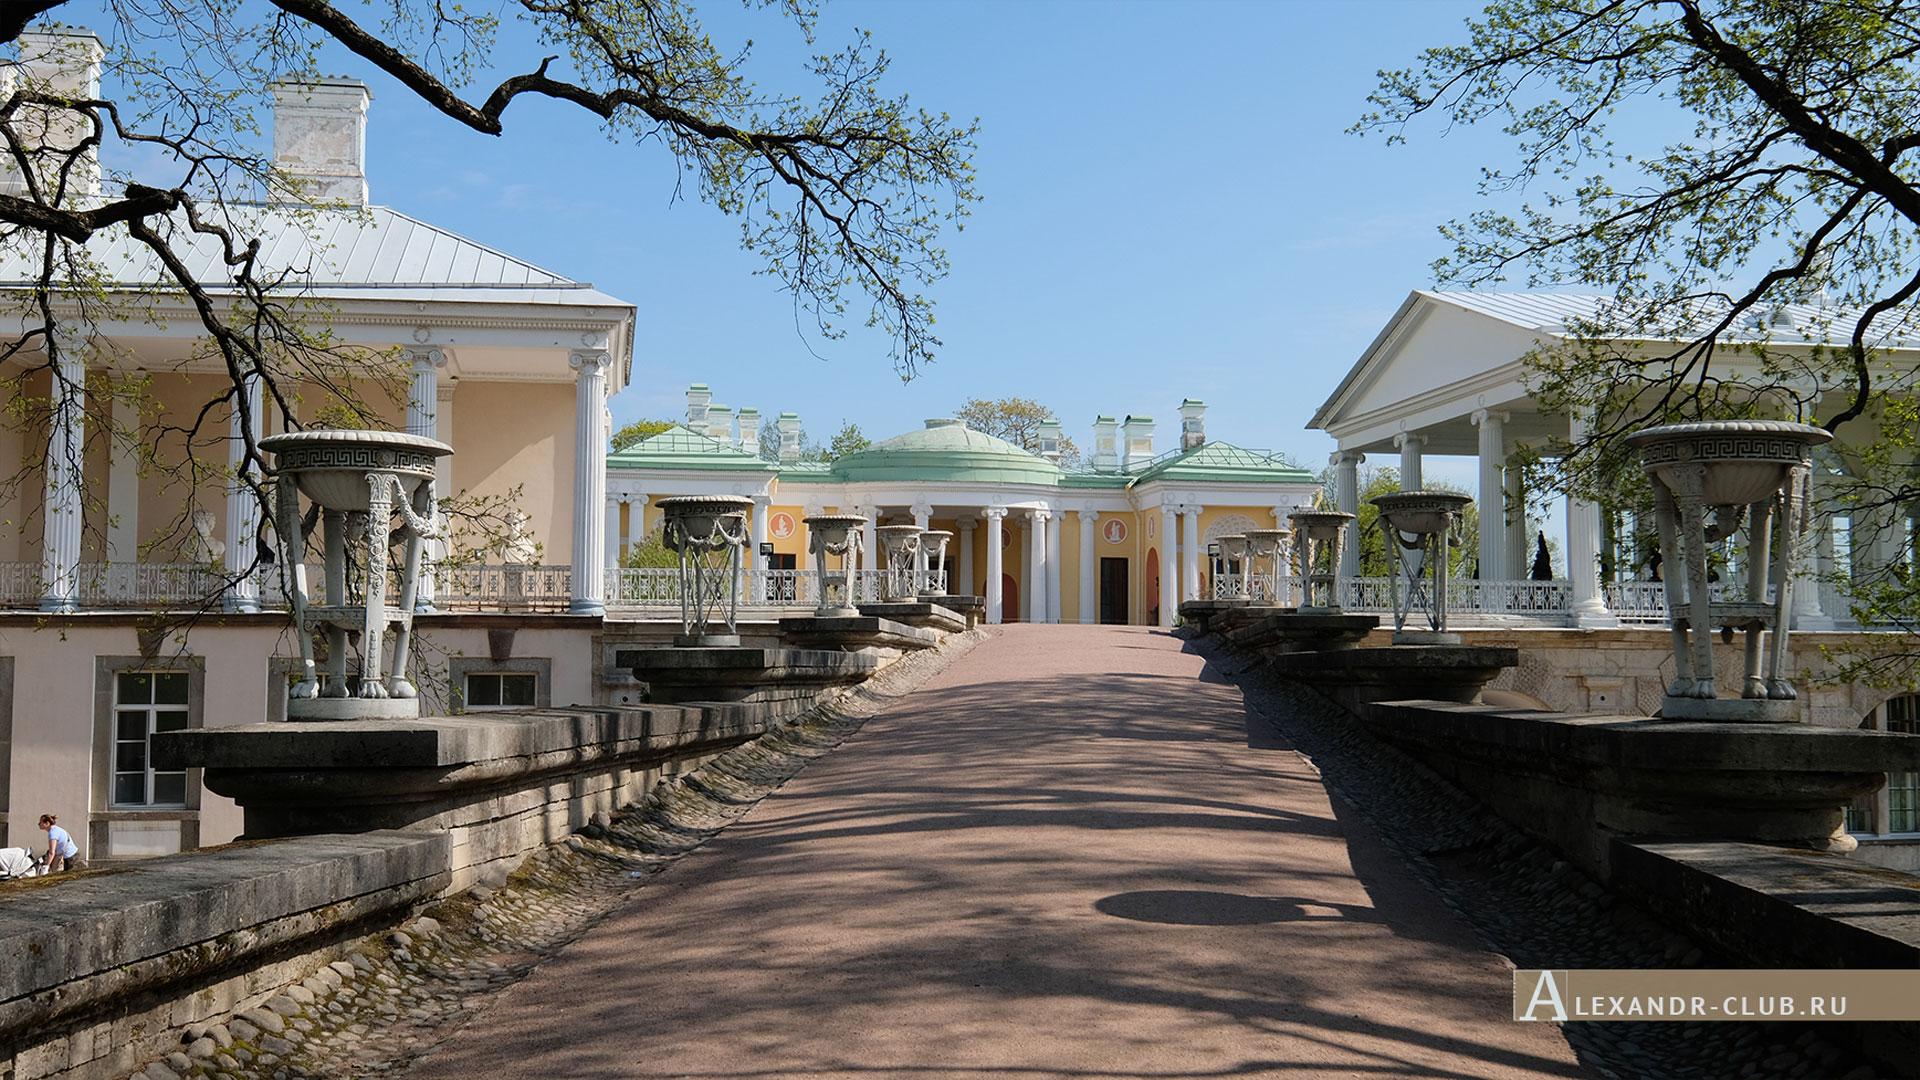 Царское Село, весна, Екатерининский парк, Пандус, Камеронова галерея